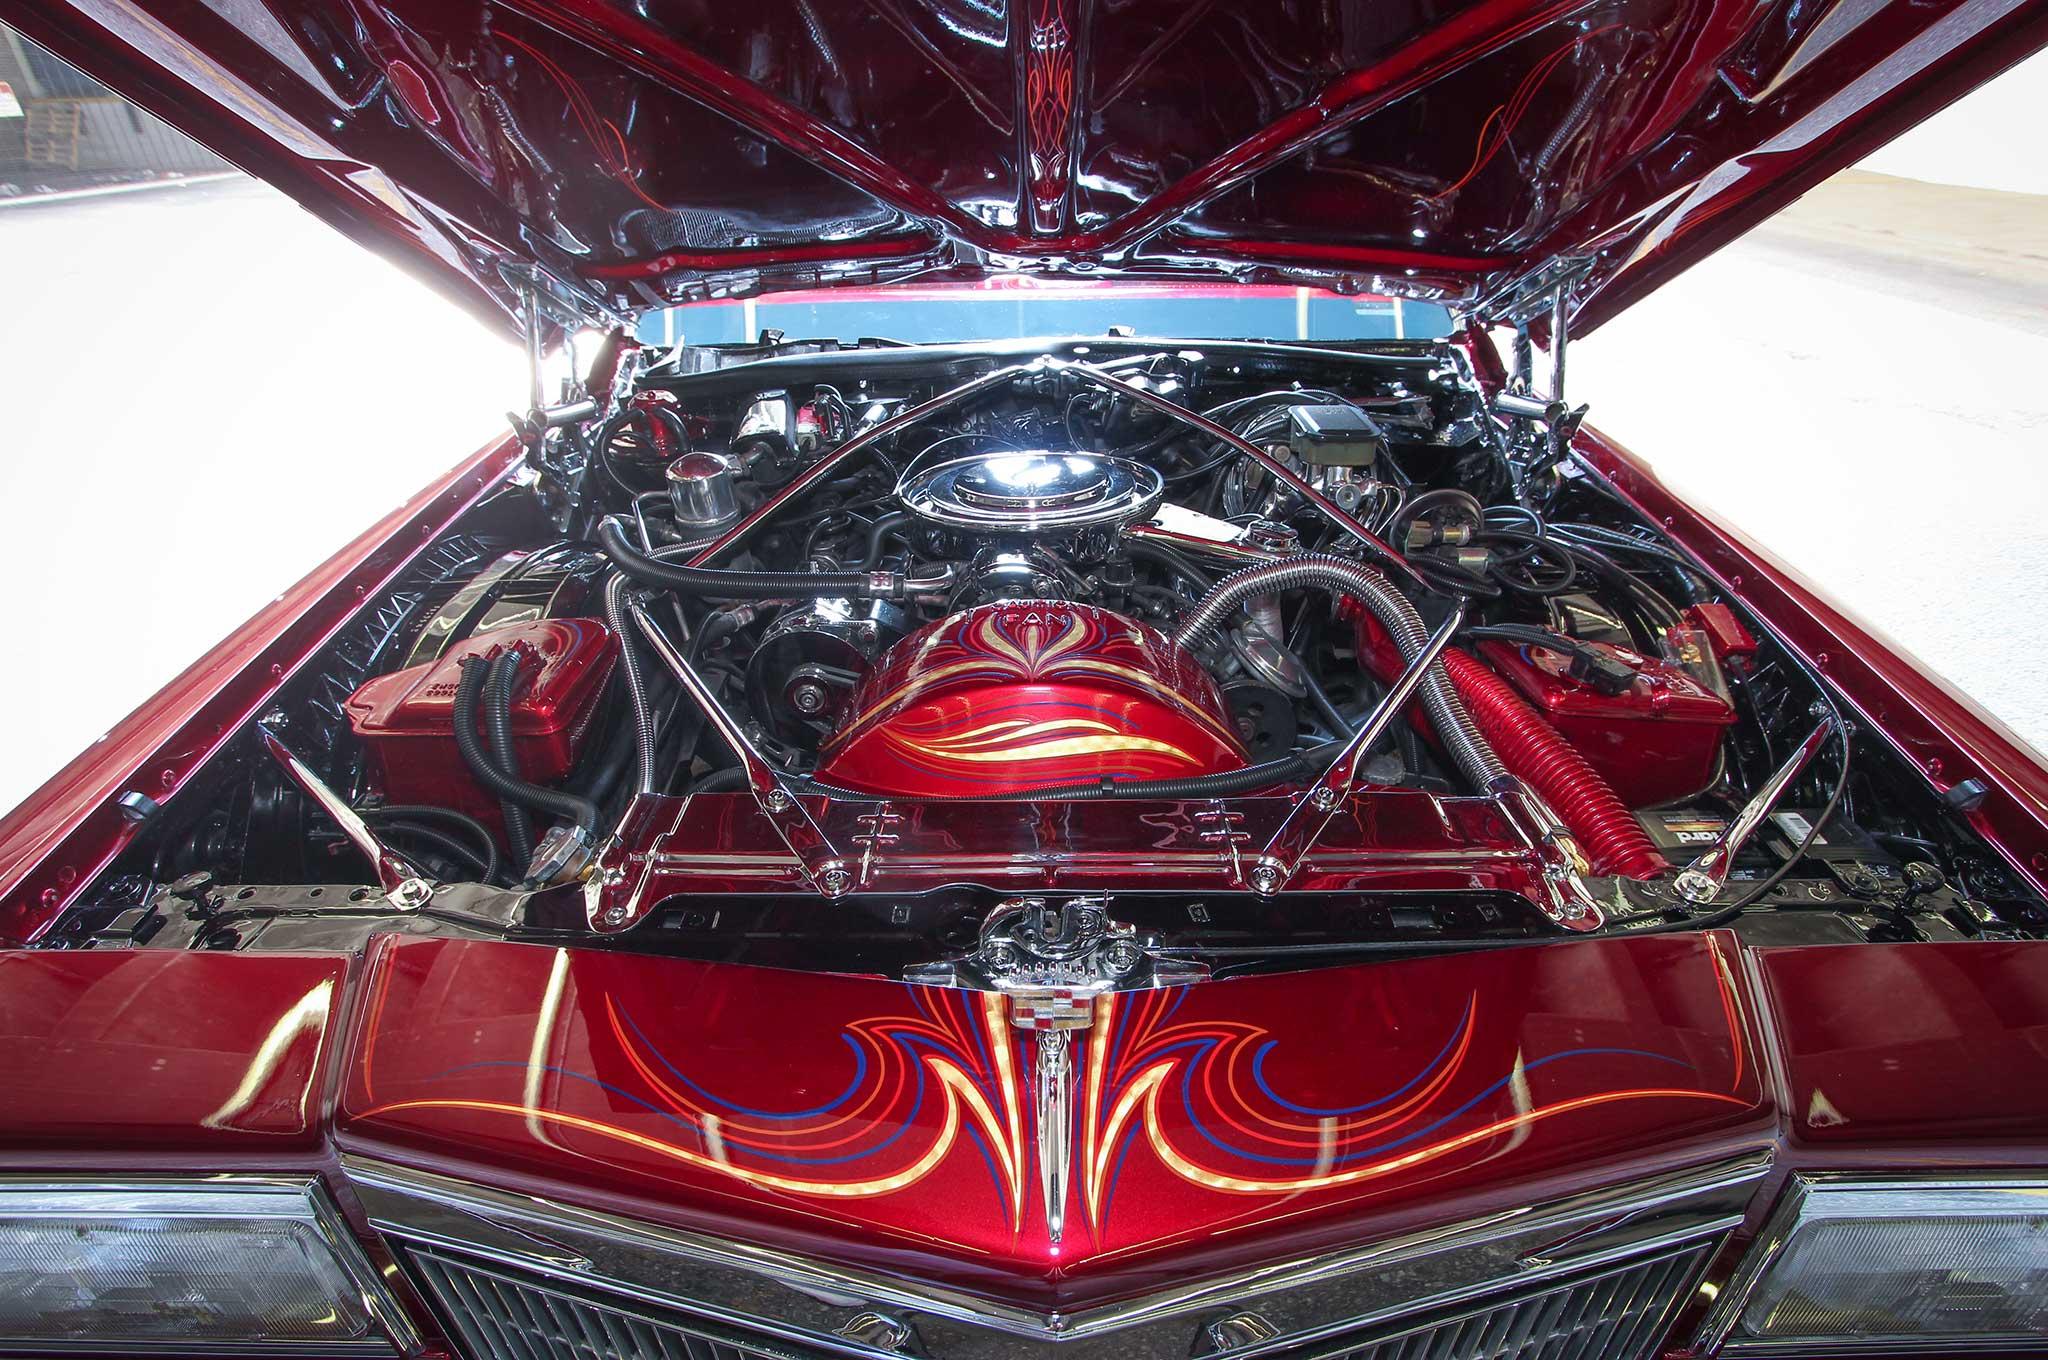 1983 cadillac coupe deville v8 engine 015